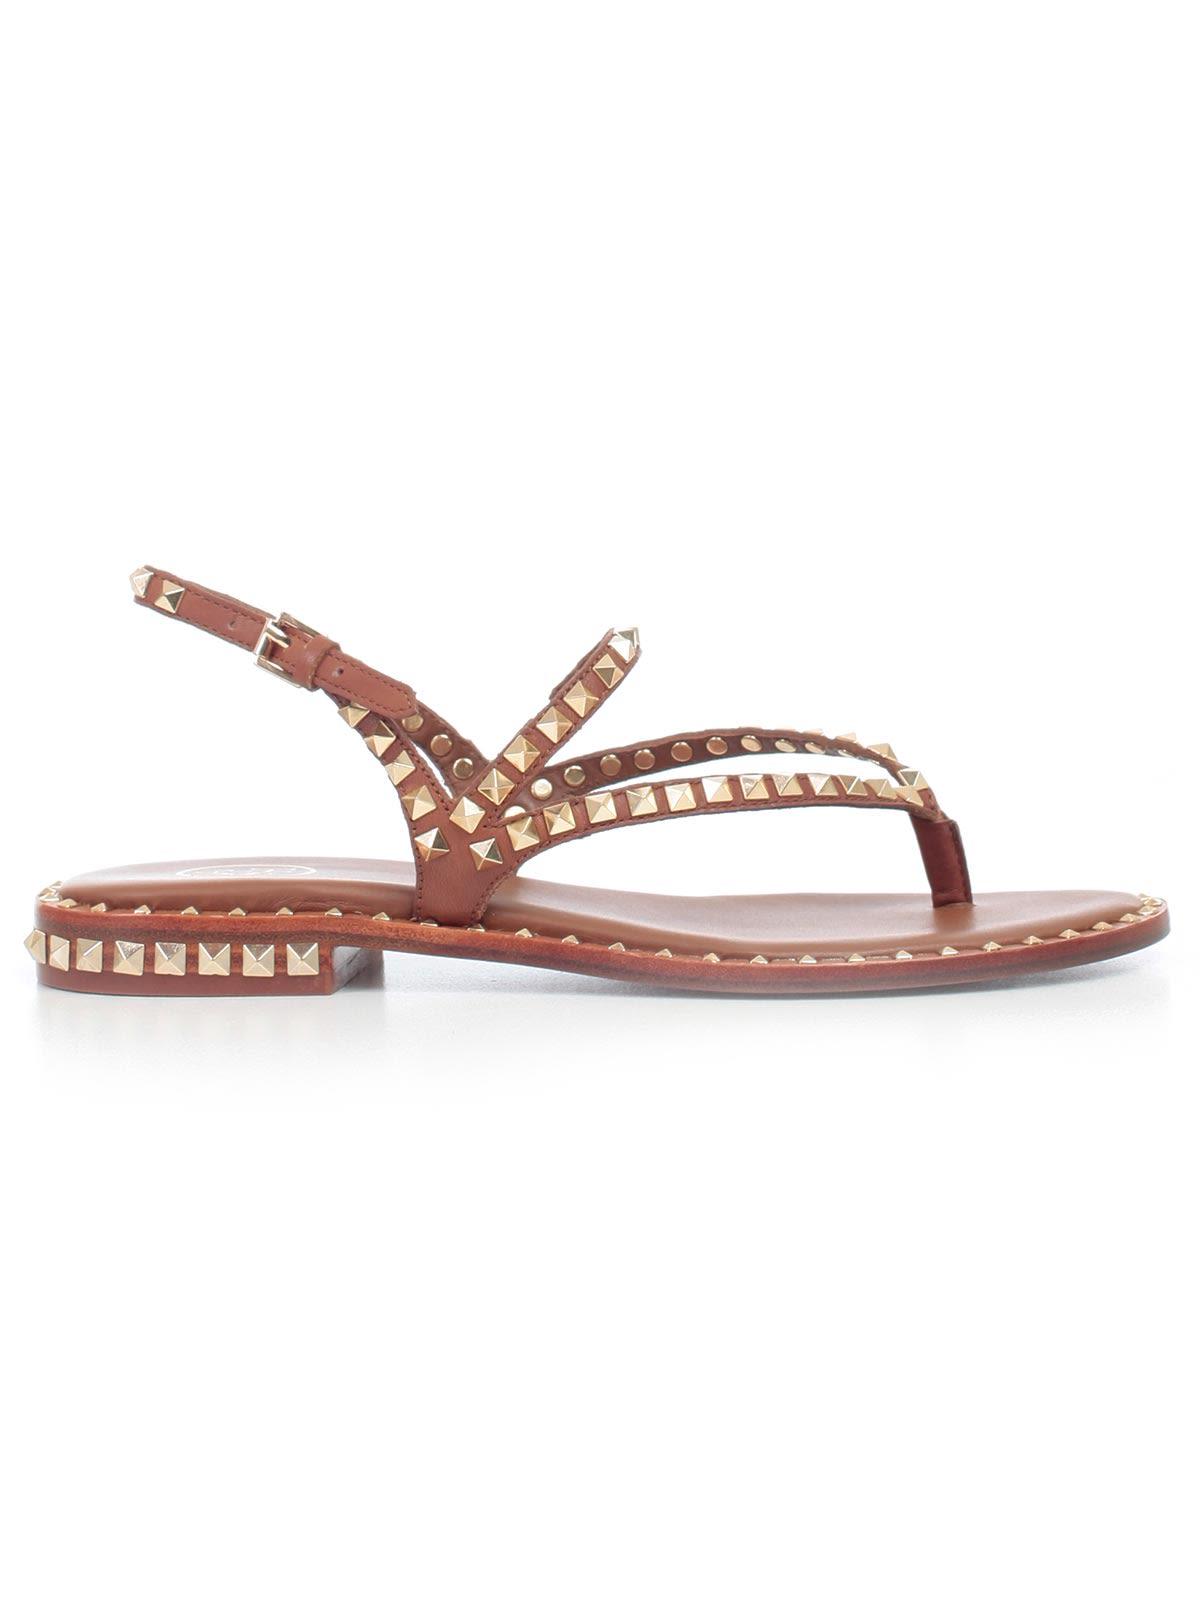 5e4f5b4e52ae Ash Ash Peps Studded Sandals - Brown - 10792858